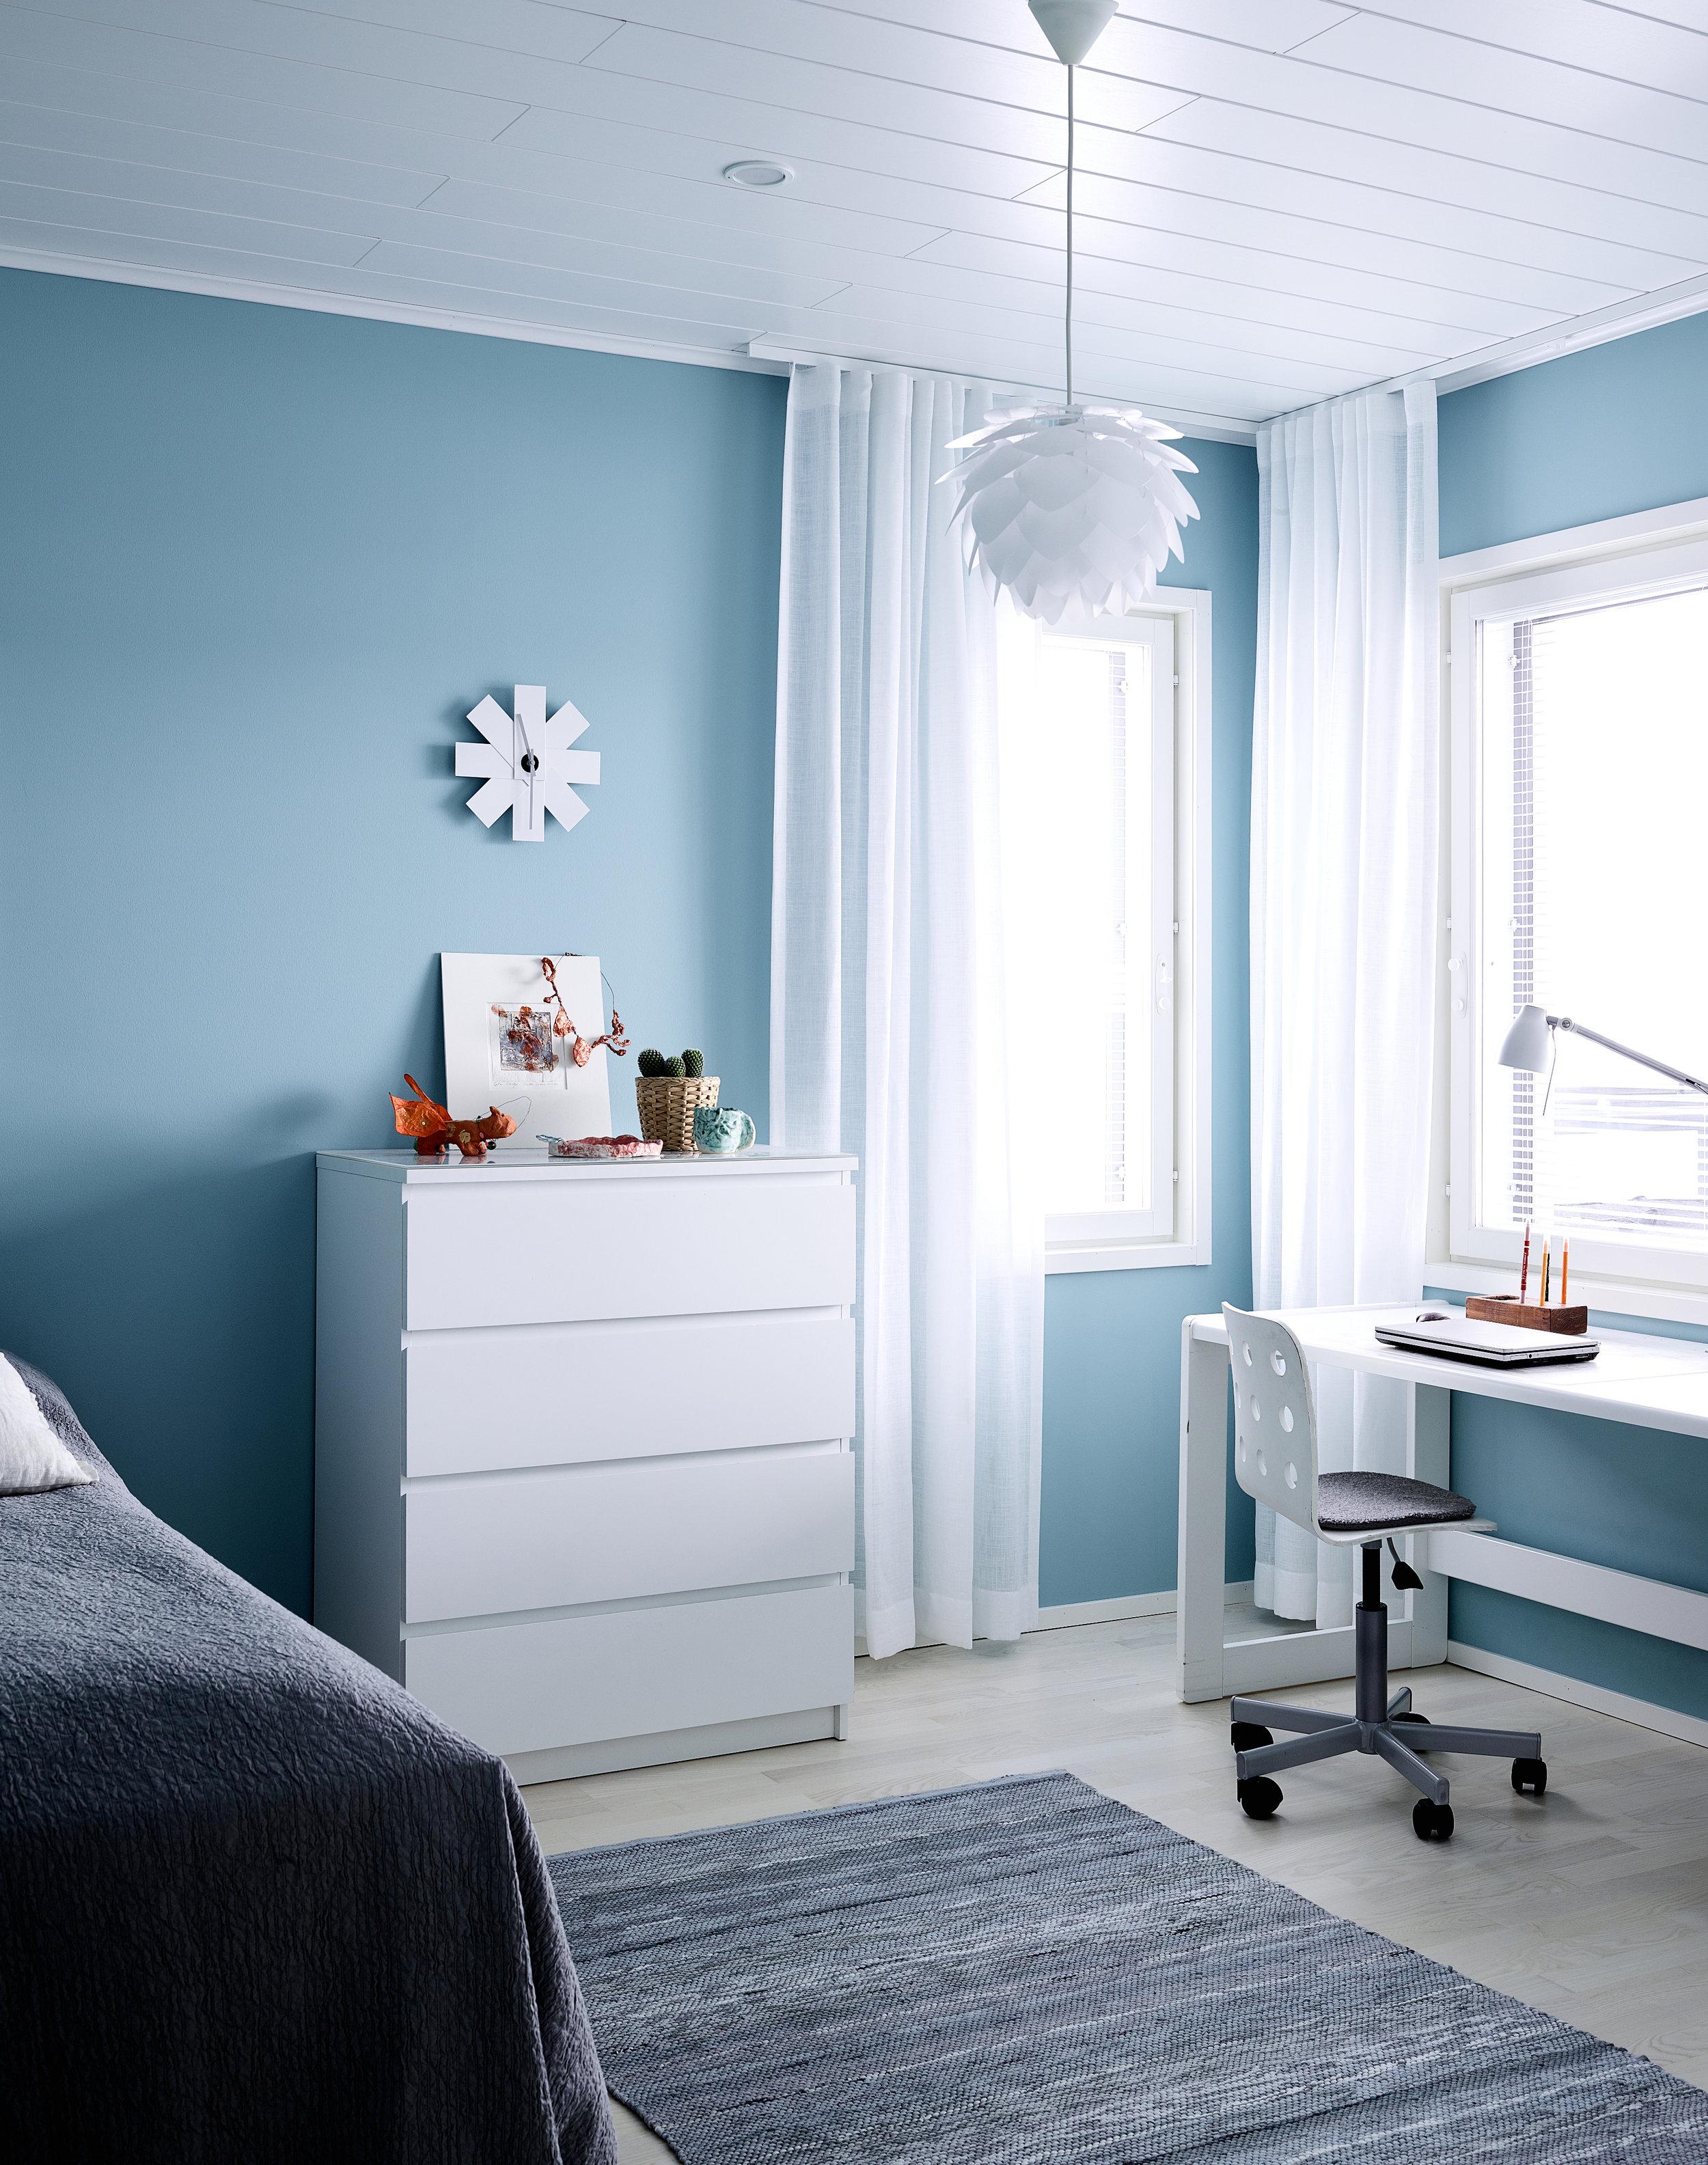 interior-anna-koponen-photo-krista-keltanen-10.jpg